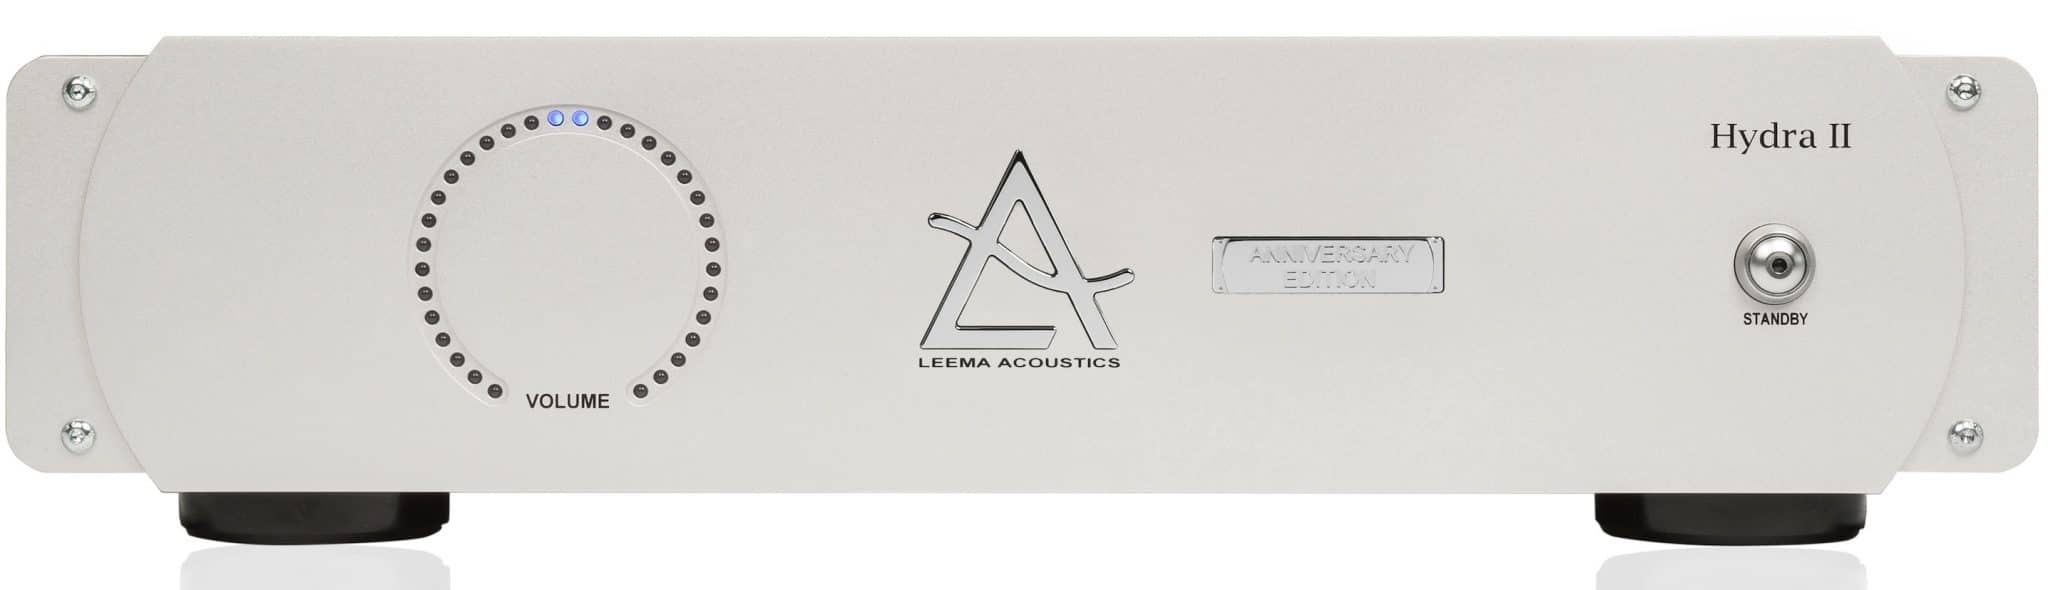 Hydra II Anniversary from Leema